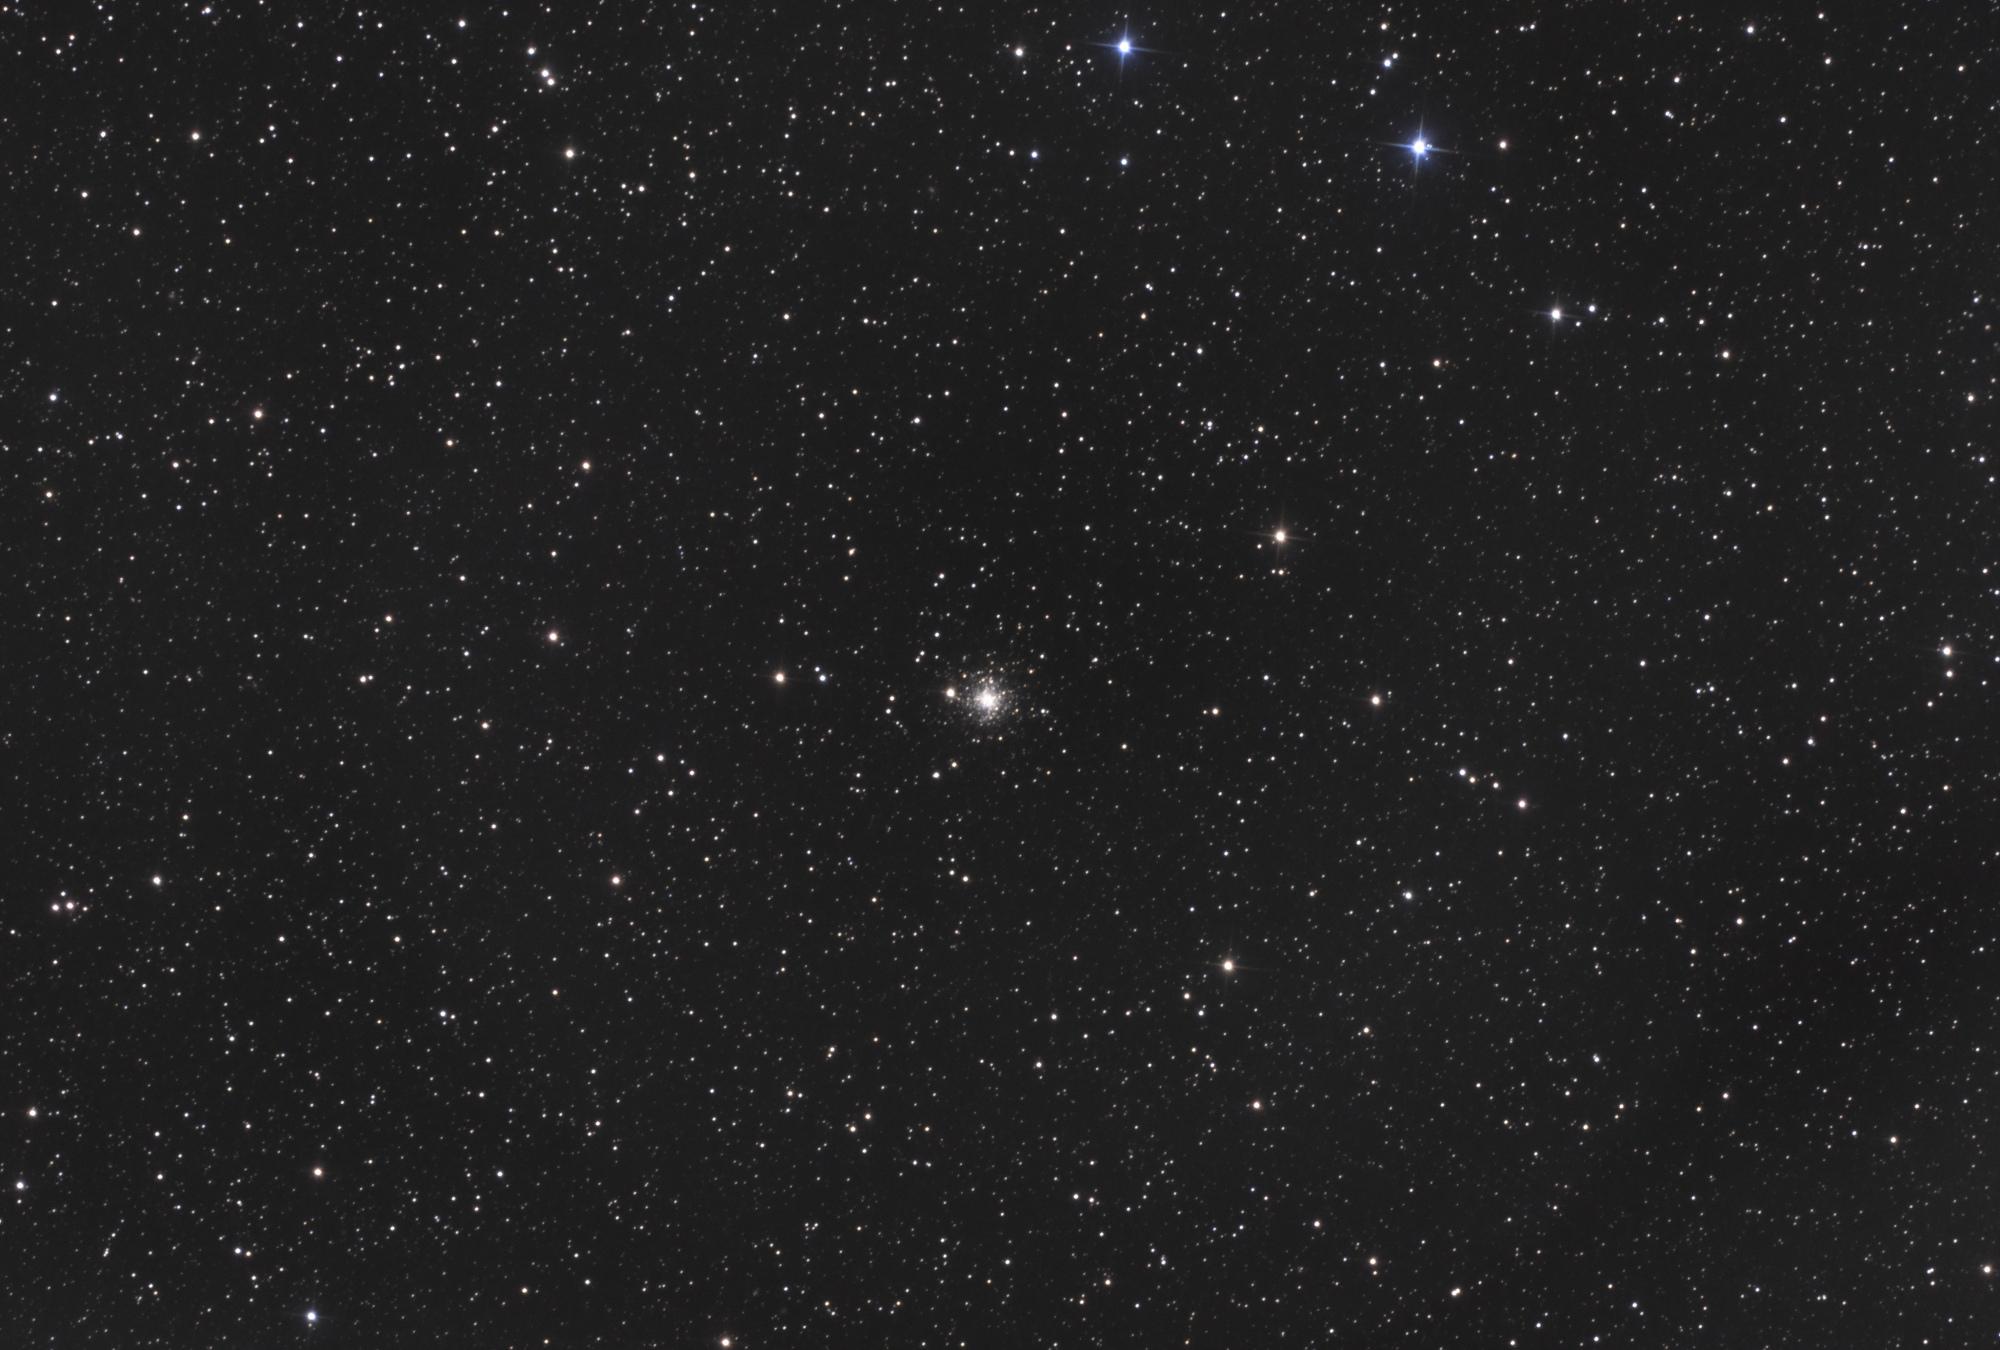 NGC6934_RGB-siril-finales.thumb.jpg.ec2bb9b51ed17b6245ab14efccaa259a.jpg